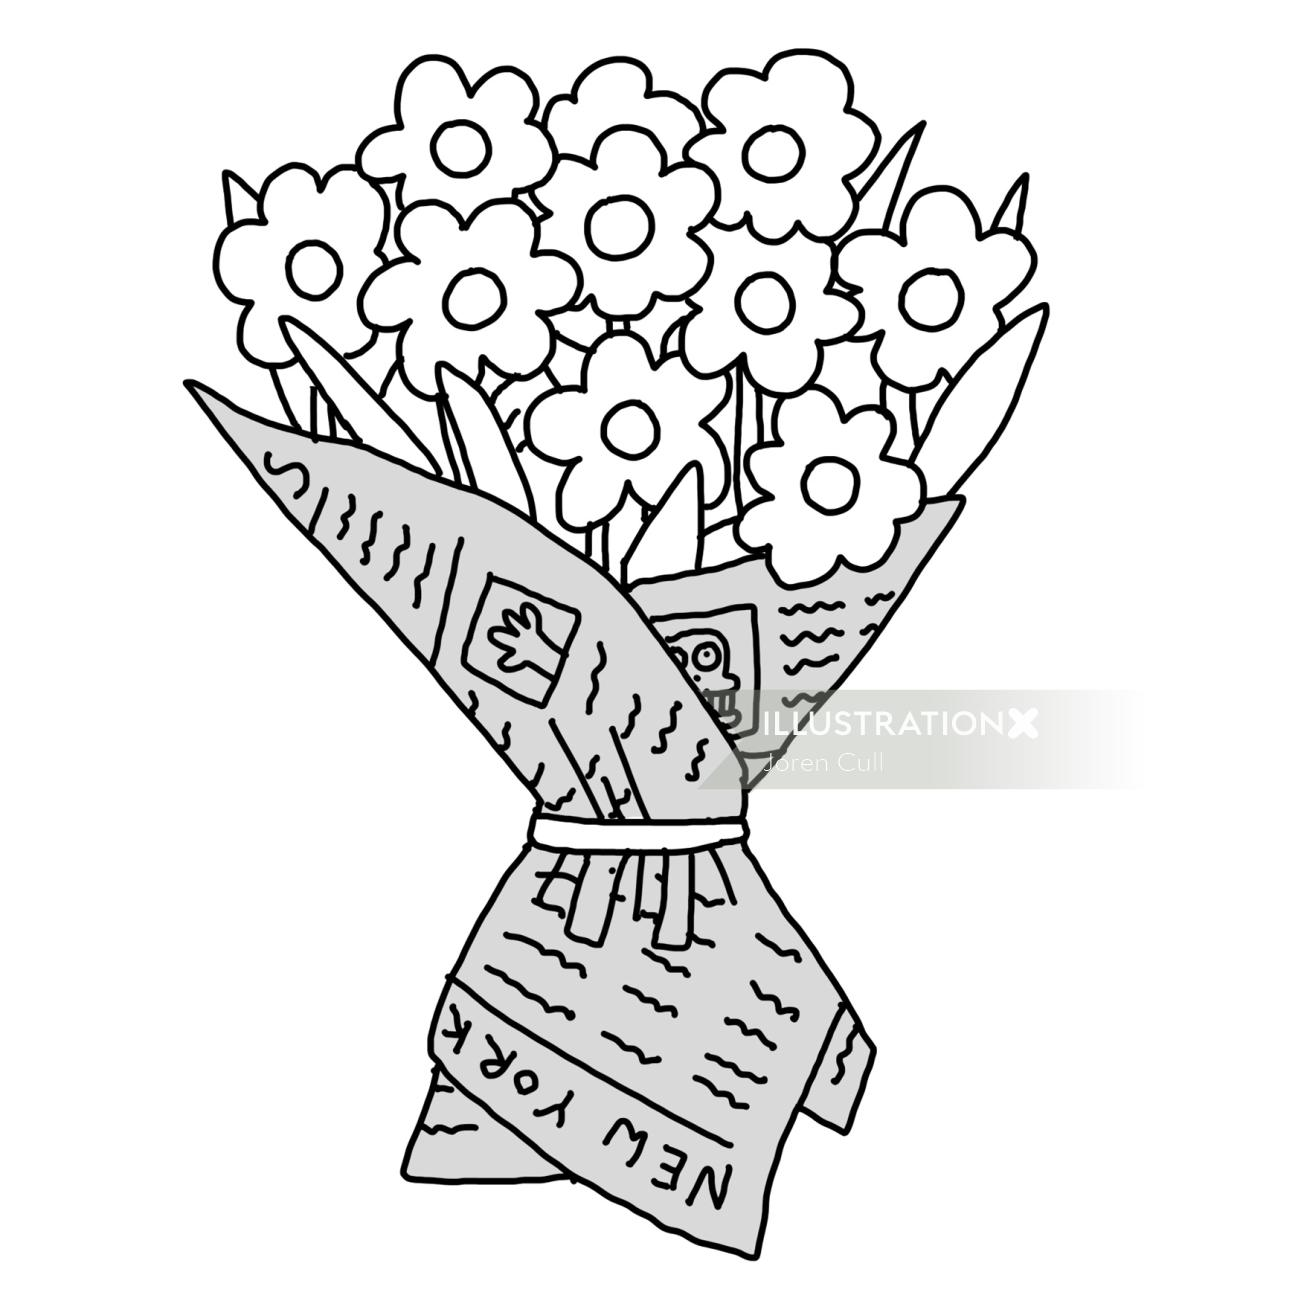 Line illustration of flower bouquet